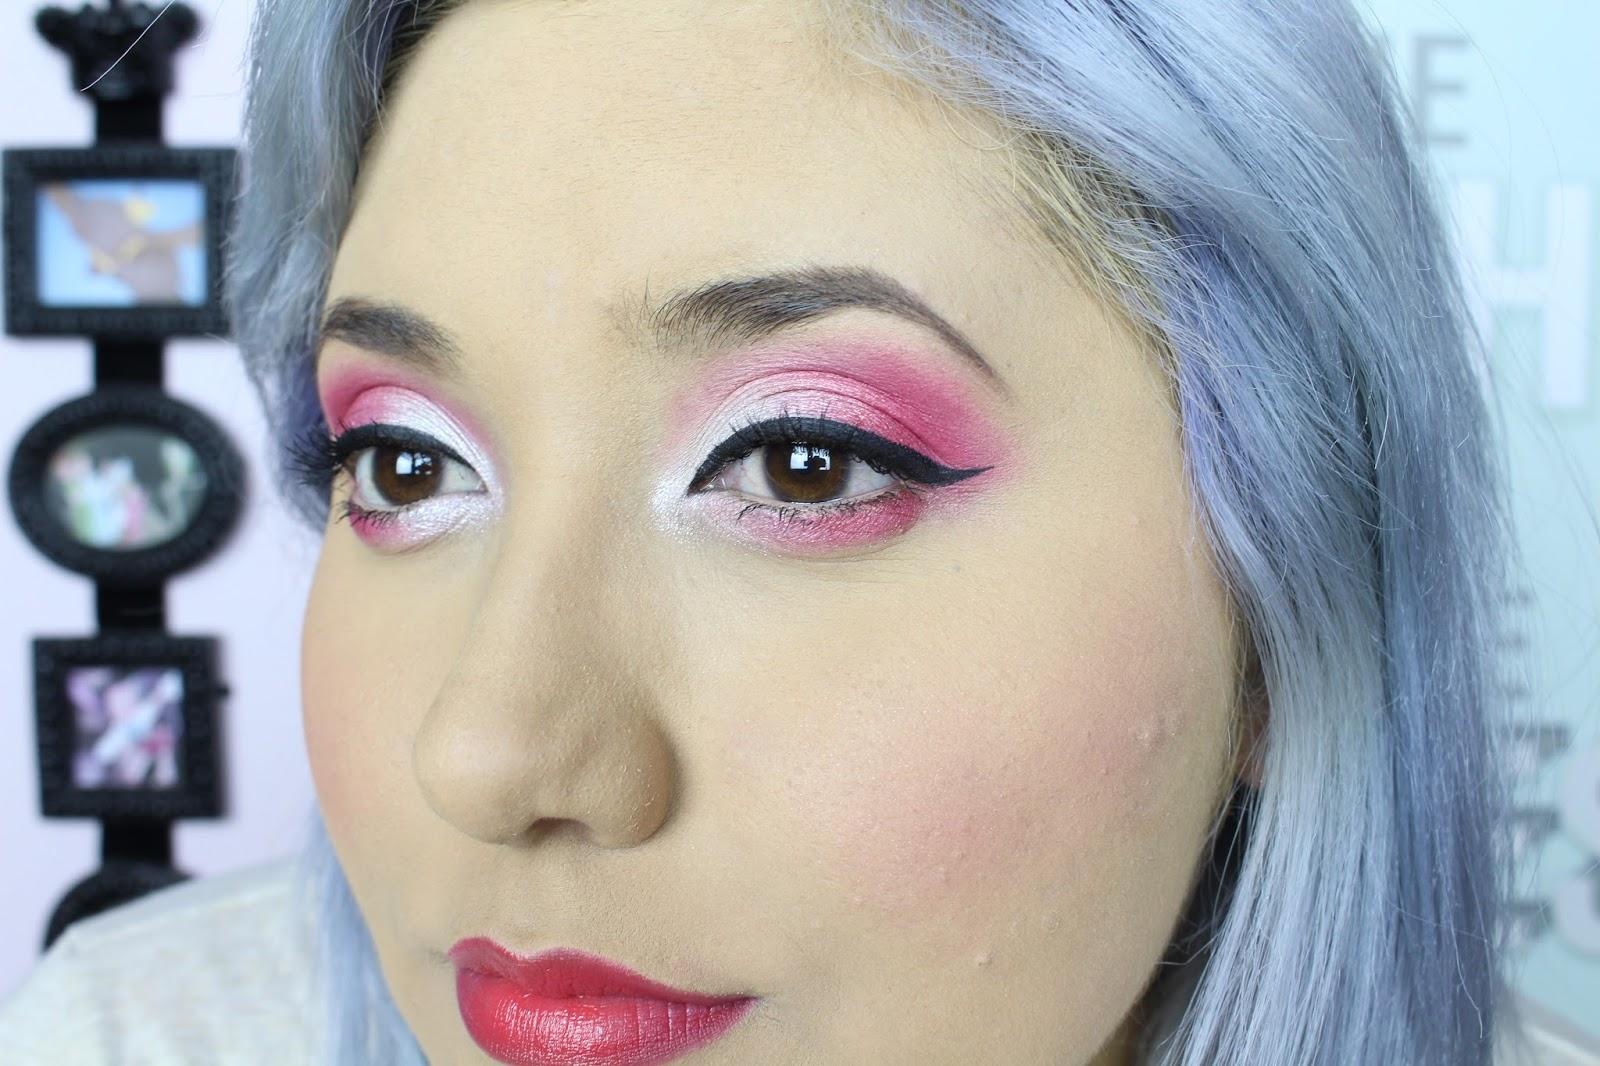 Carolcarol92 Disney Lilo And Stitch Lilo Inspired Makeup